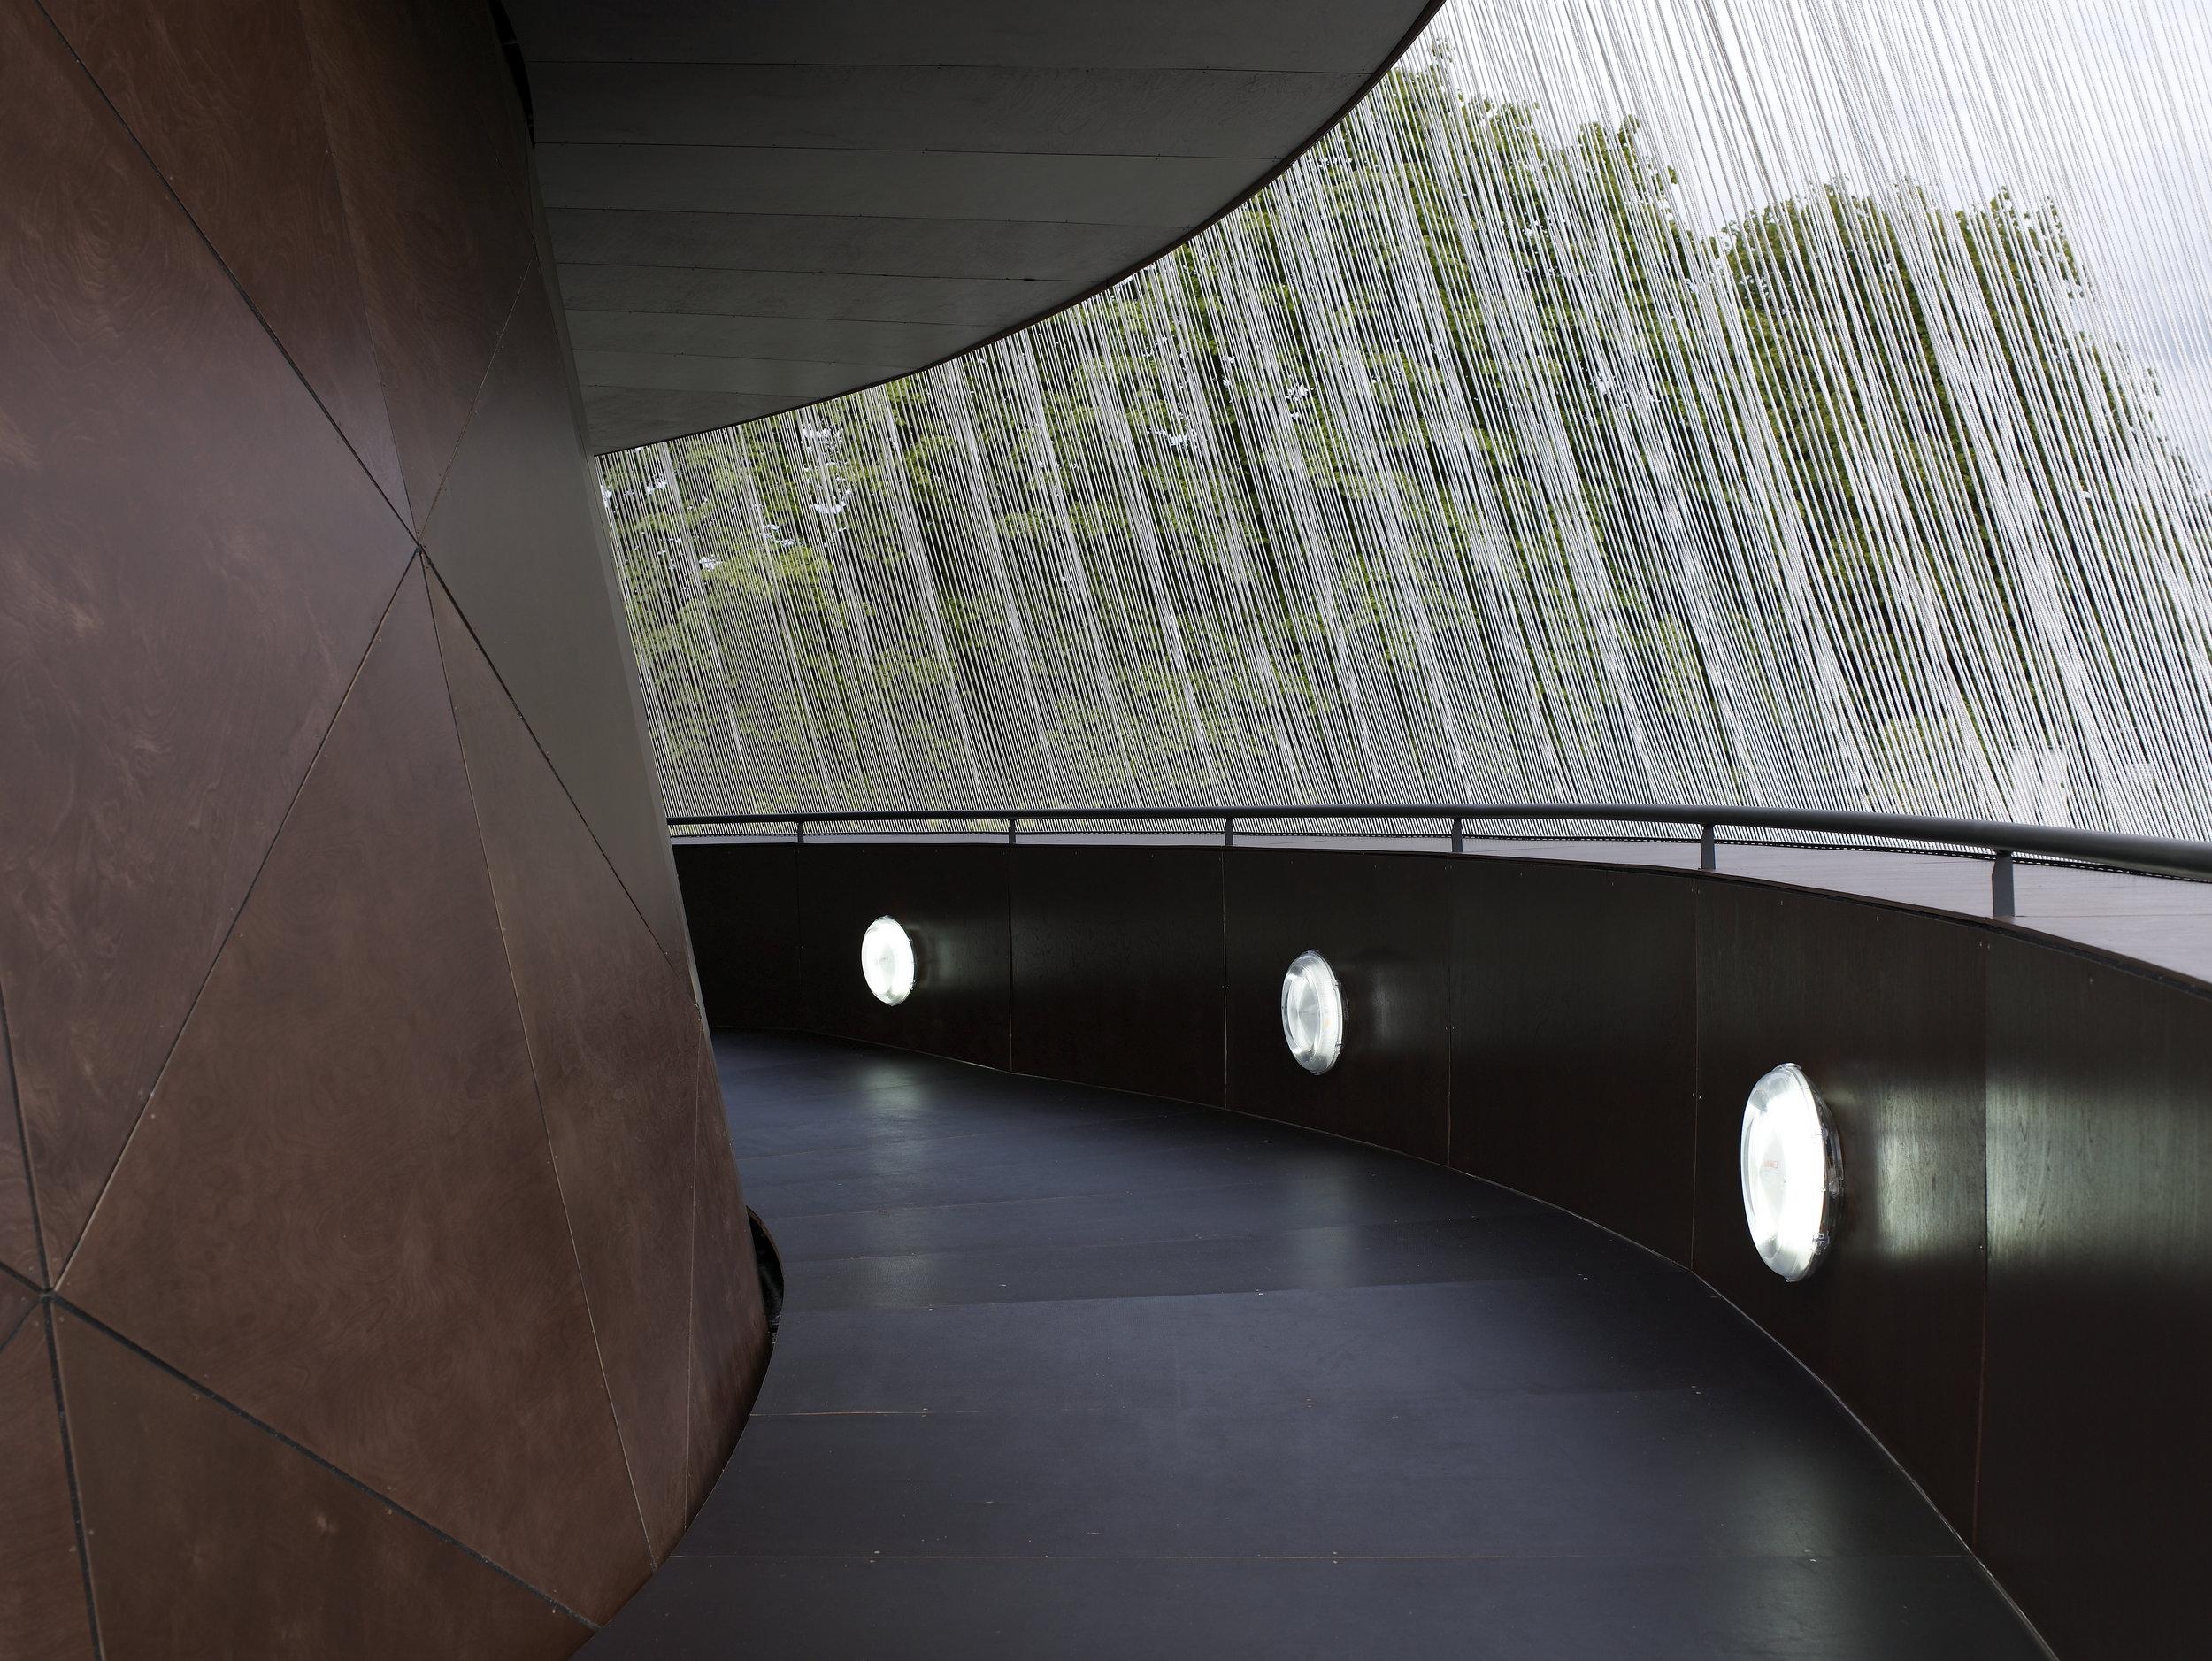 Image 12 of 34 | Serpentine Gallery Pavilion 2007 by Olafur Eliasson and Kjetil Thorsen